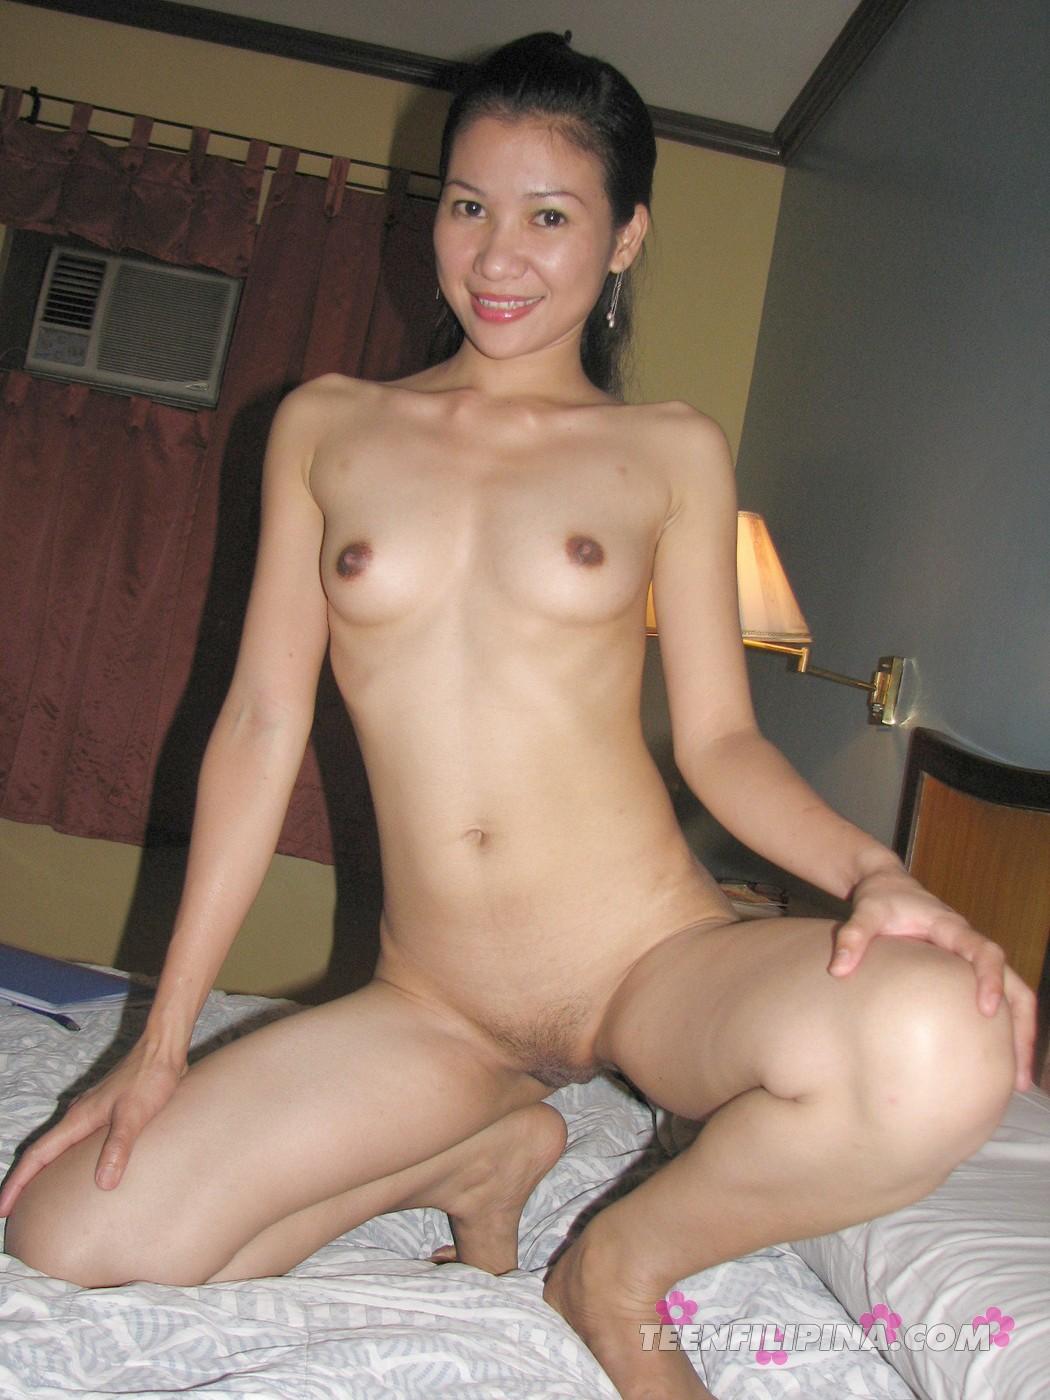 Girl next door gets naked remarkable, rather